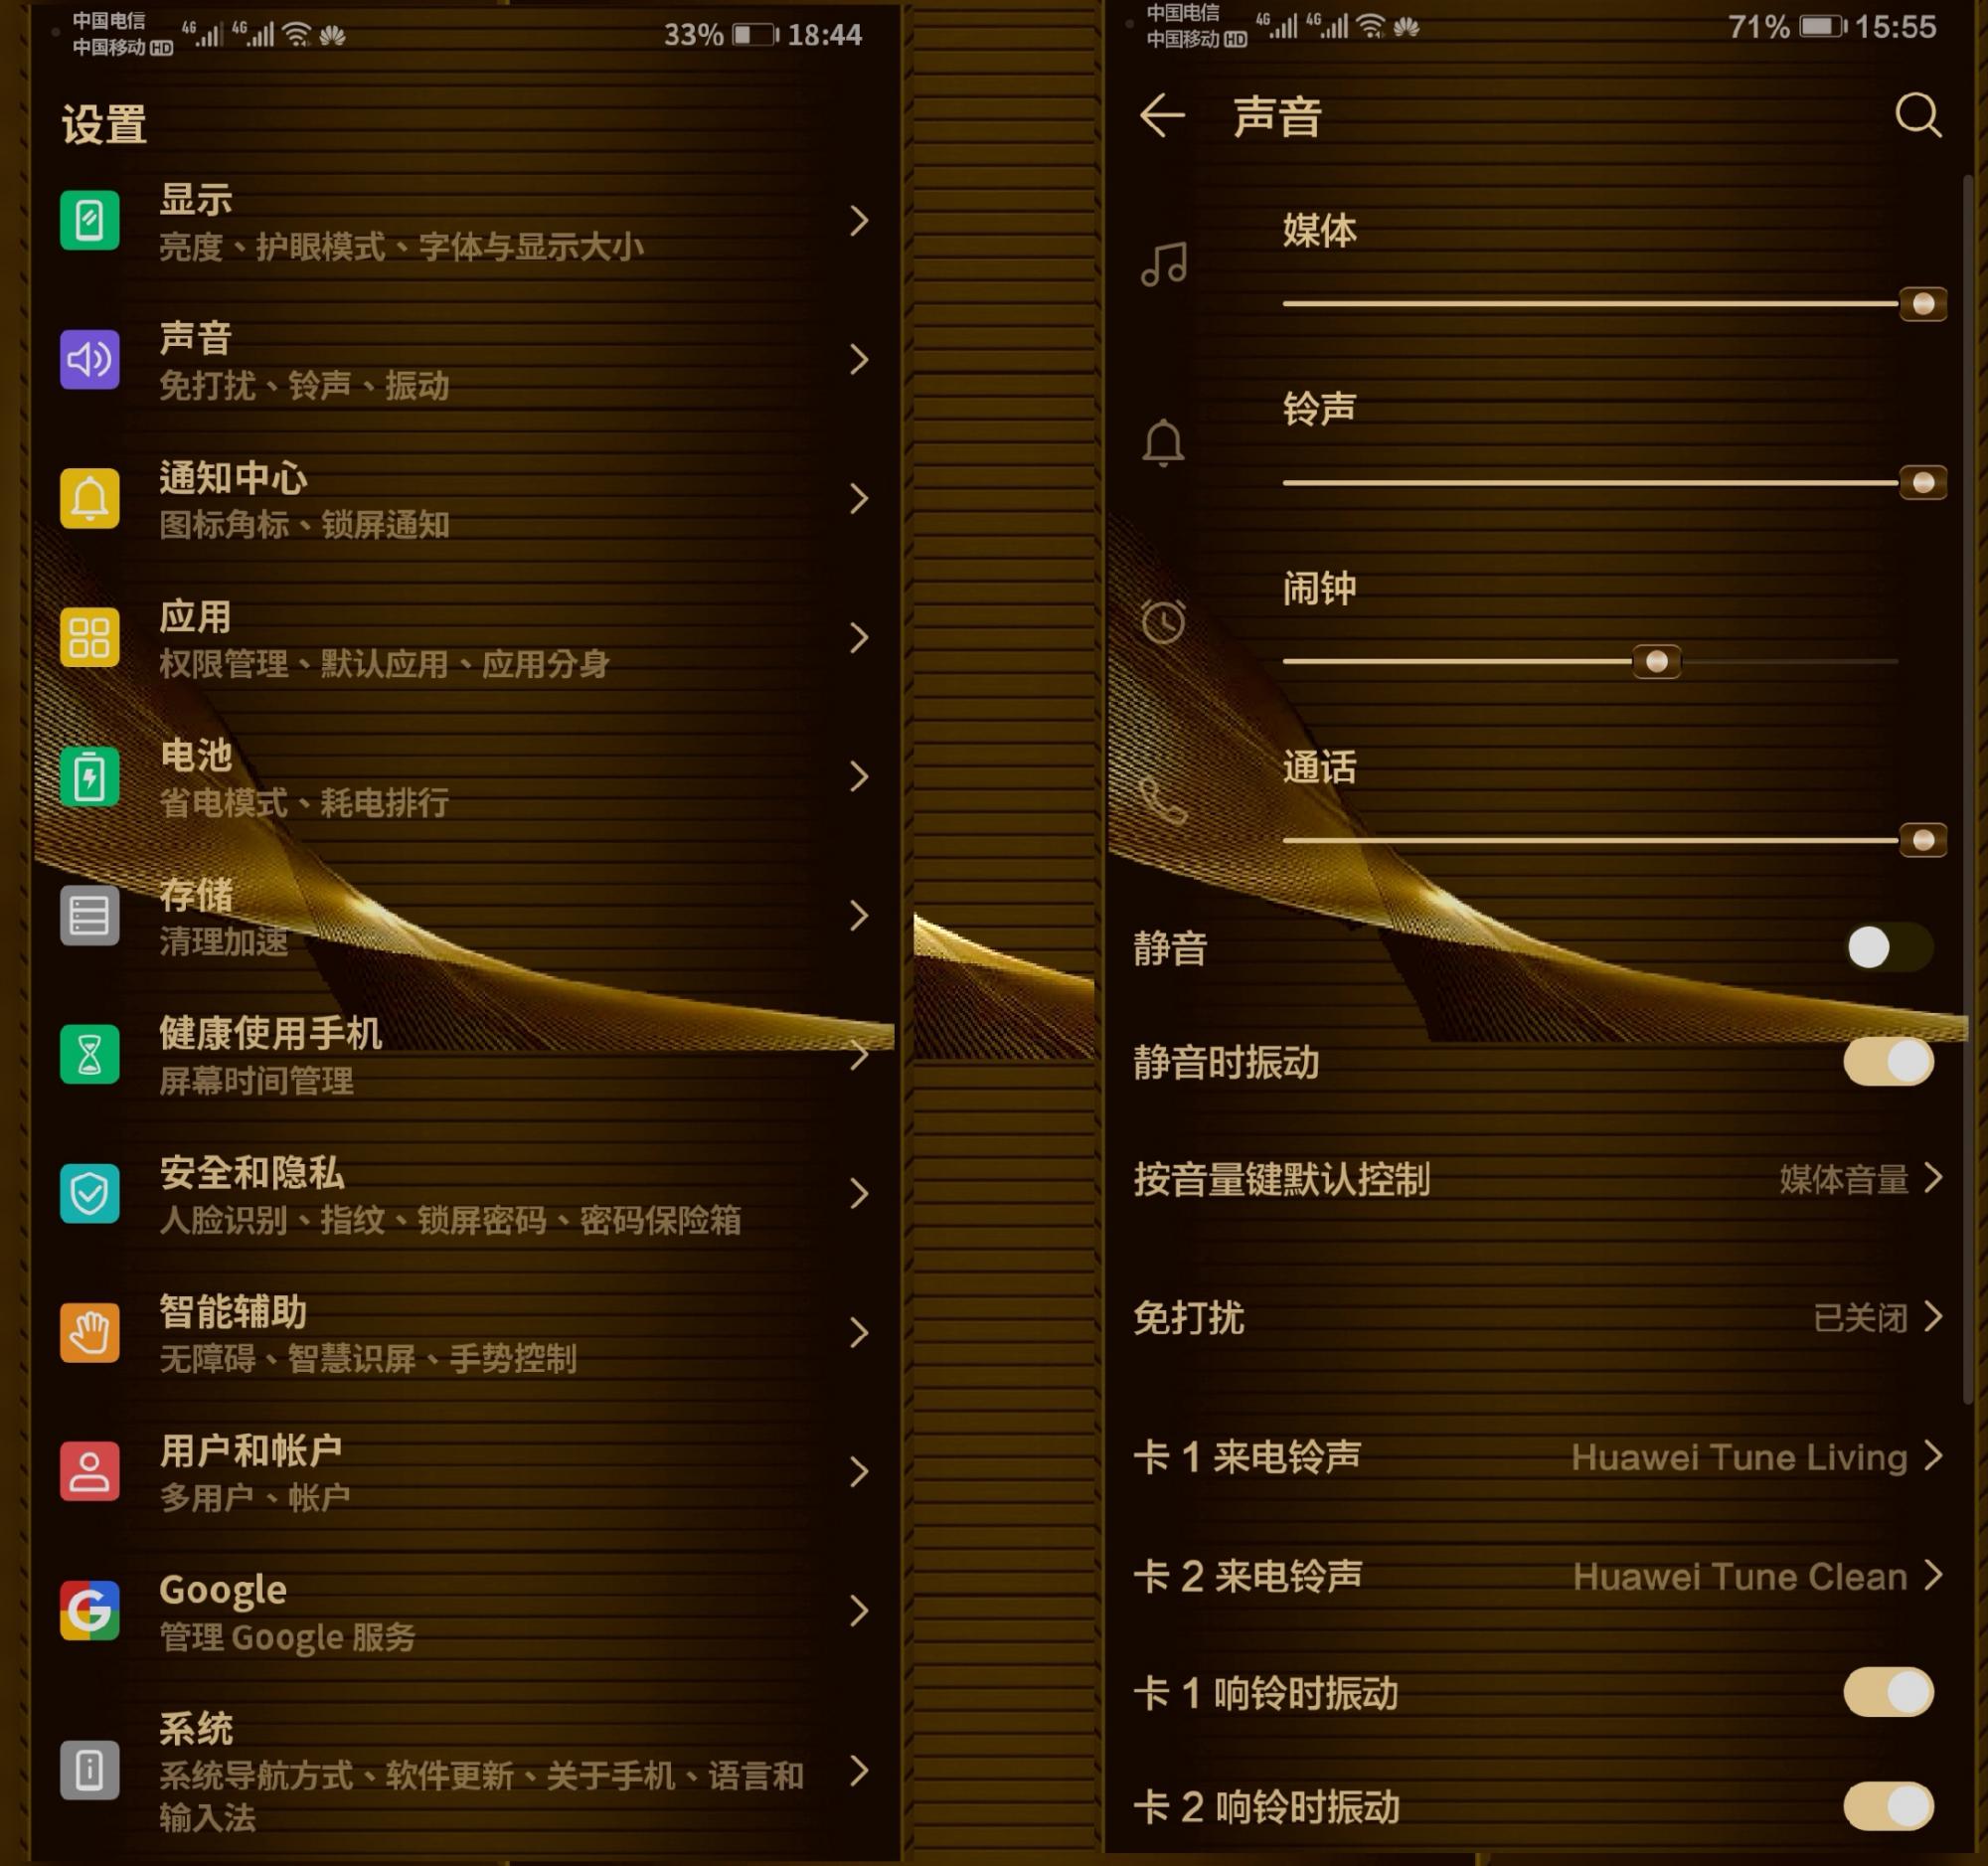 background_emui.9_1566364717566_1566377788746_1566378811595.jpg